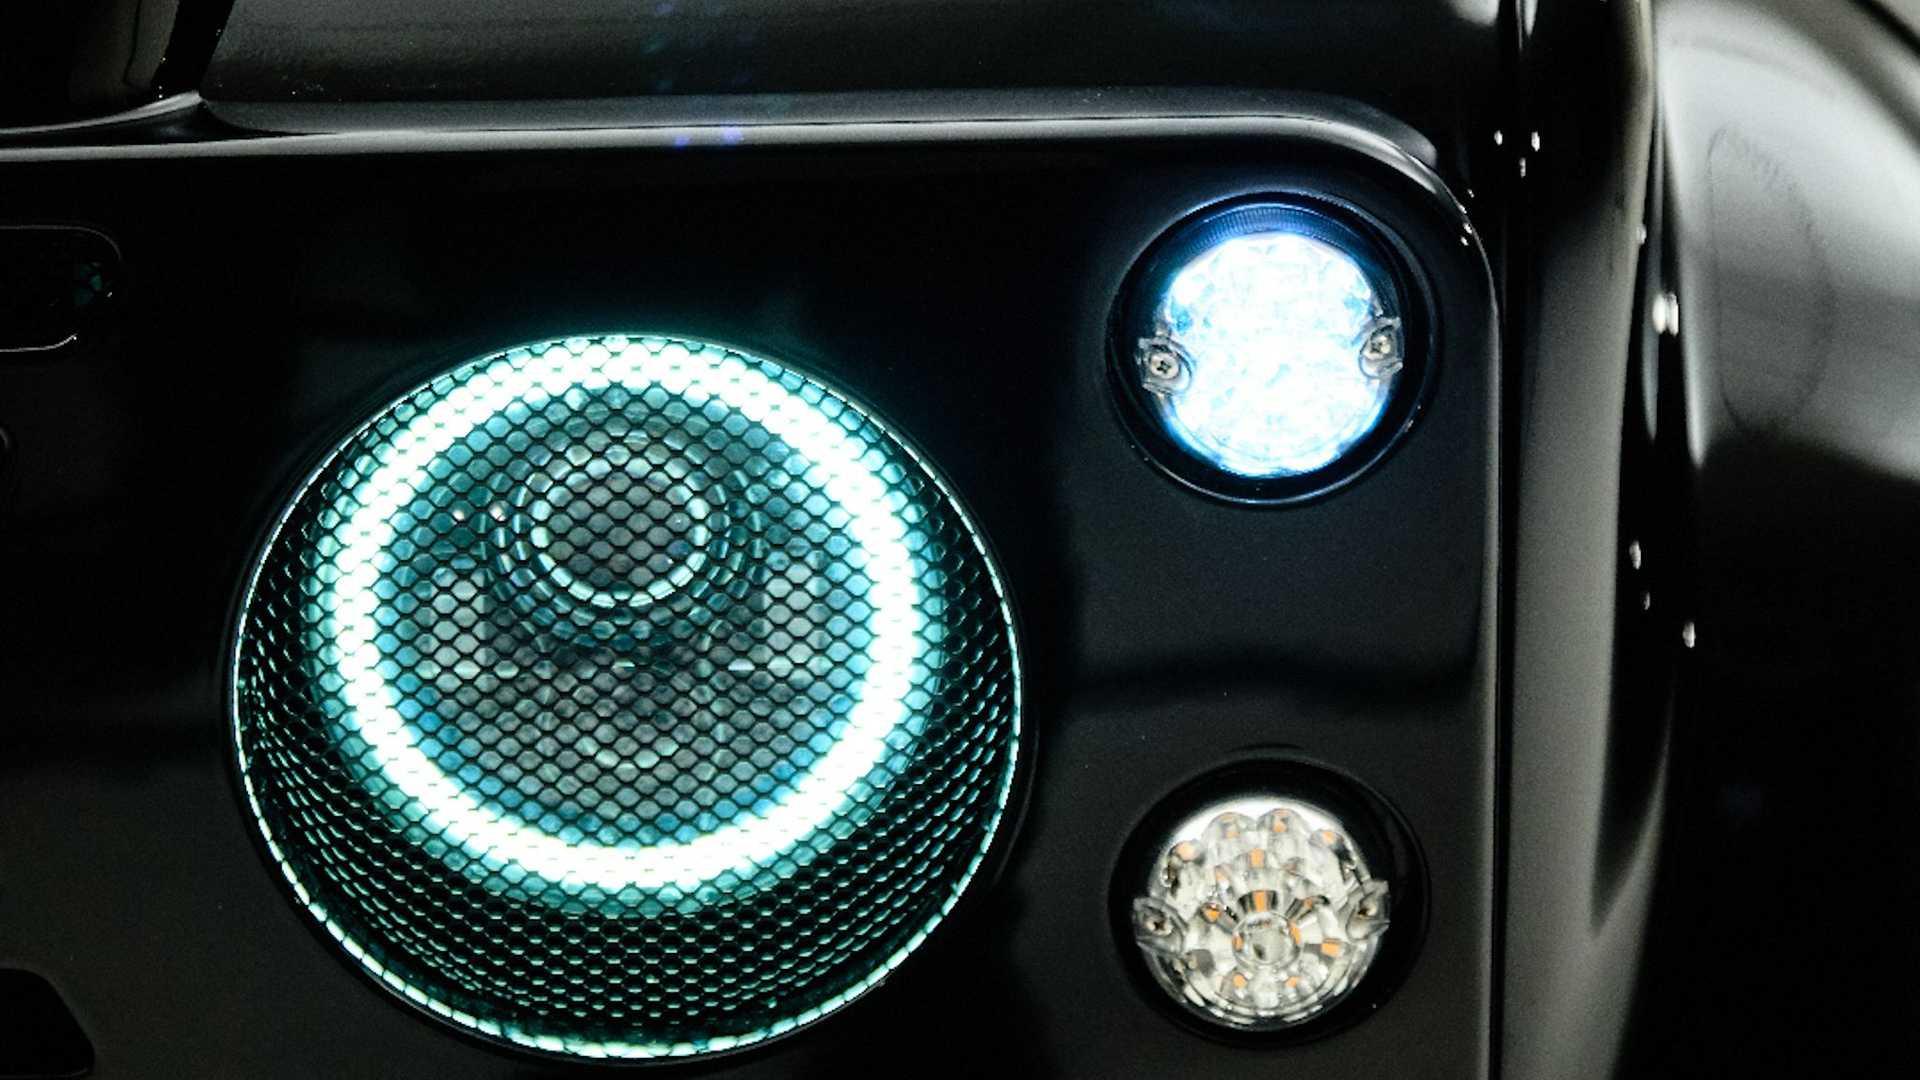 低調不起來的精緻改裝─Ares Design 發表「Defender Spec 1.2」